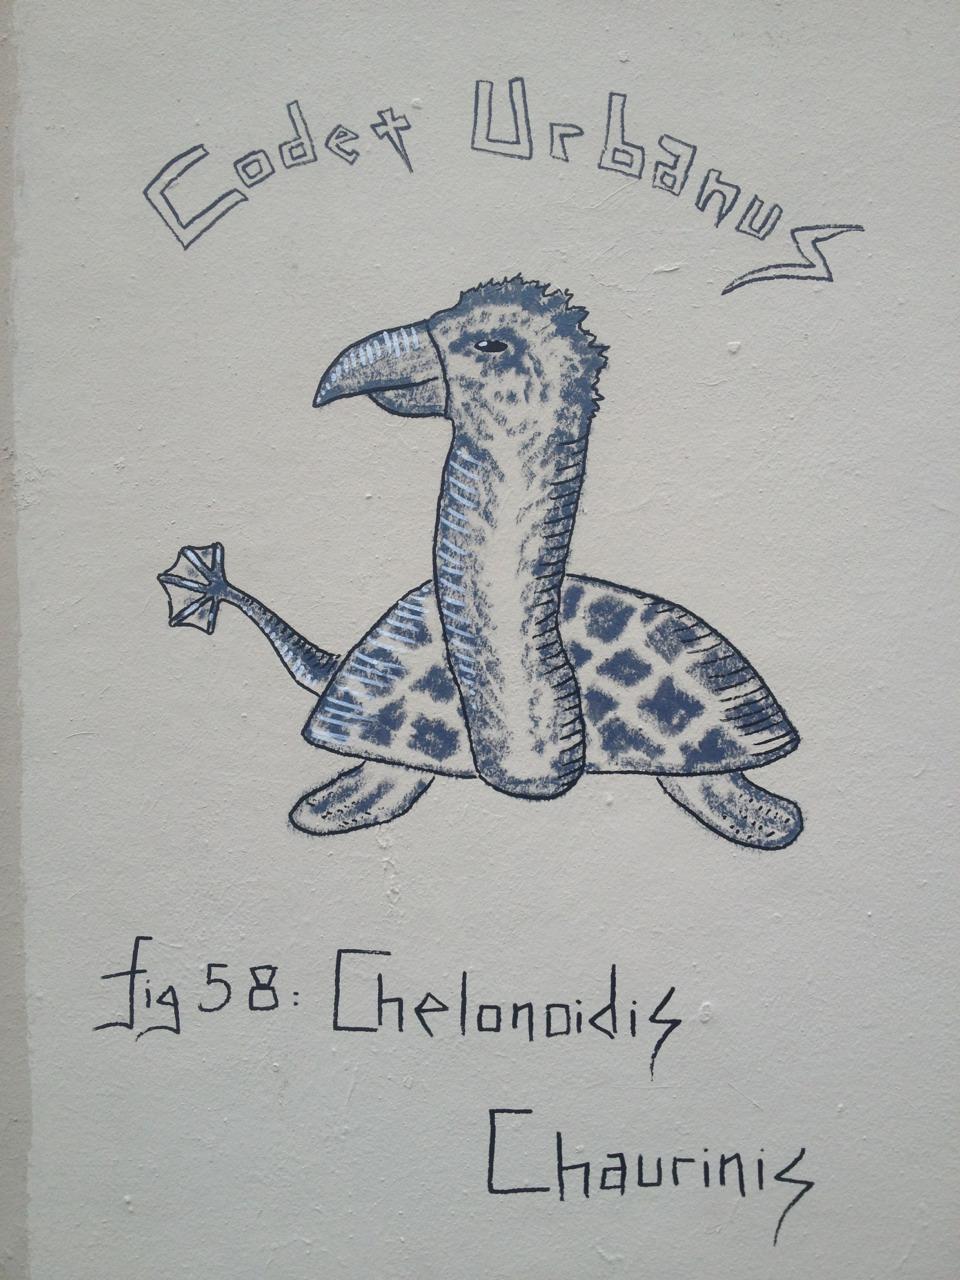 Cheloniidis Chaurinis